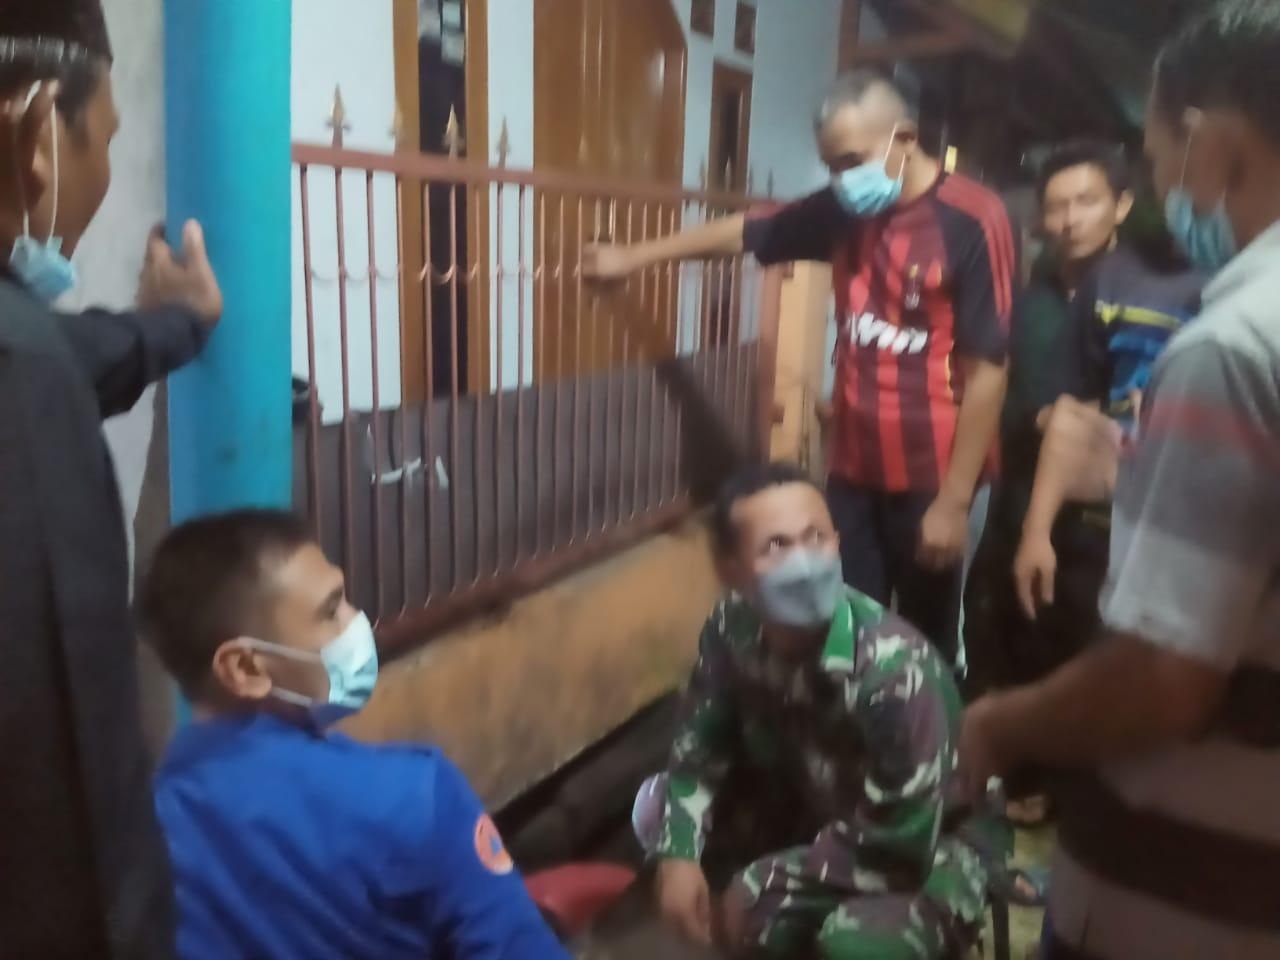 Petugas gabungan dan warga setempat saat hendak mencari anak berusia dua tahun yang hilang karena terseret arus air selokan di Jalan Tanah 100, Swadaya II, Sudimara, Kecamatan Ciledug, Kota Tangerang, Jumat 4 Juni 2021 sekitar pukul 17.30 WIB.